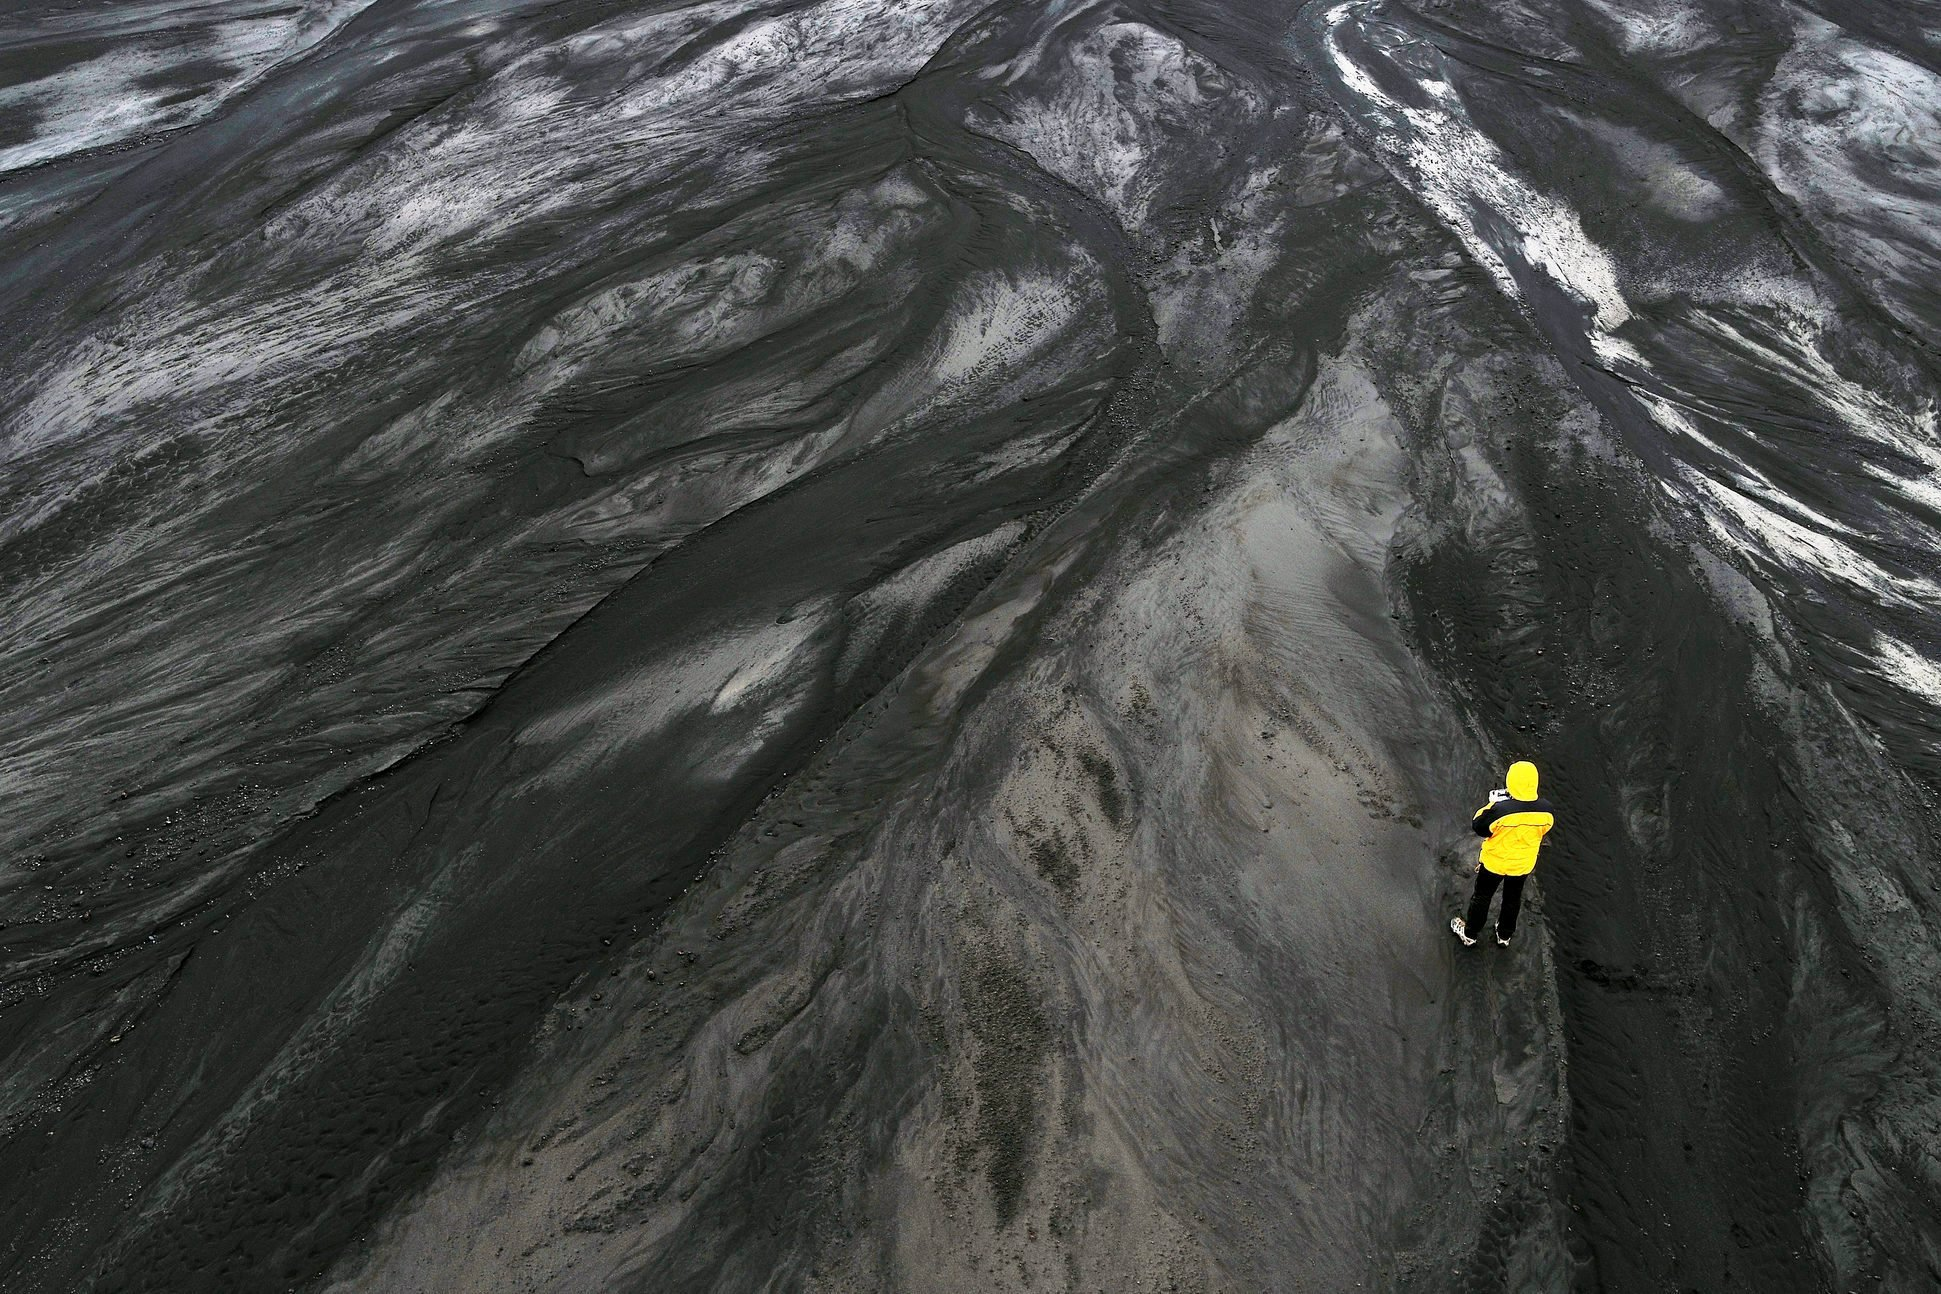 Remote location- Blacks Sands by Riverbeds, Iceland